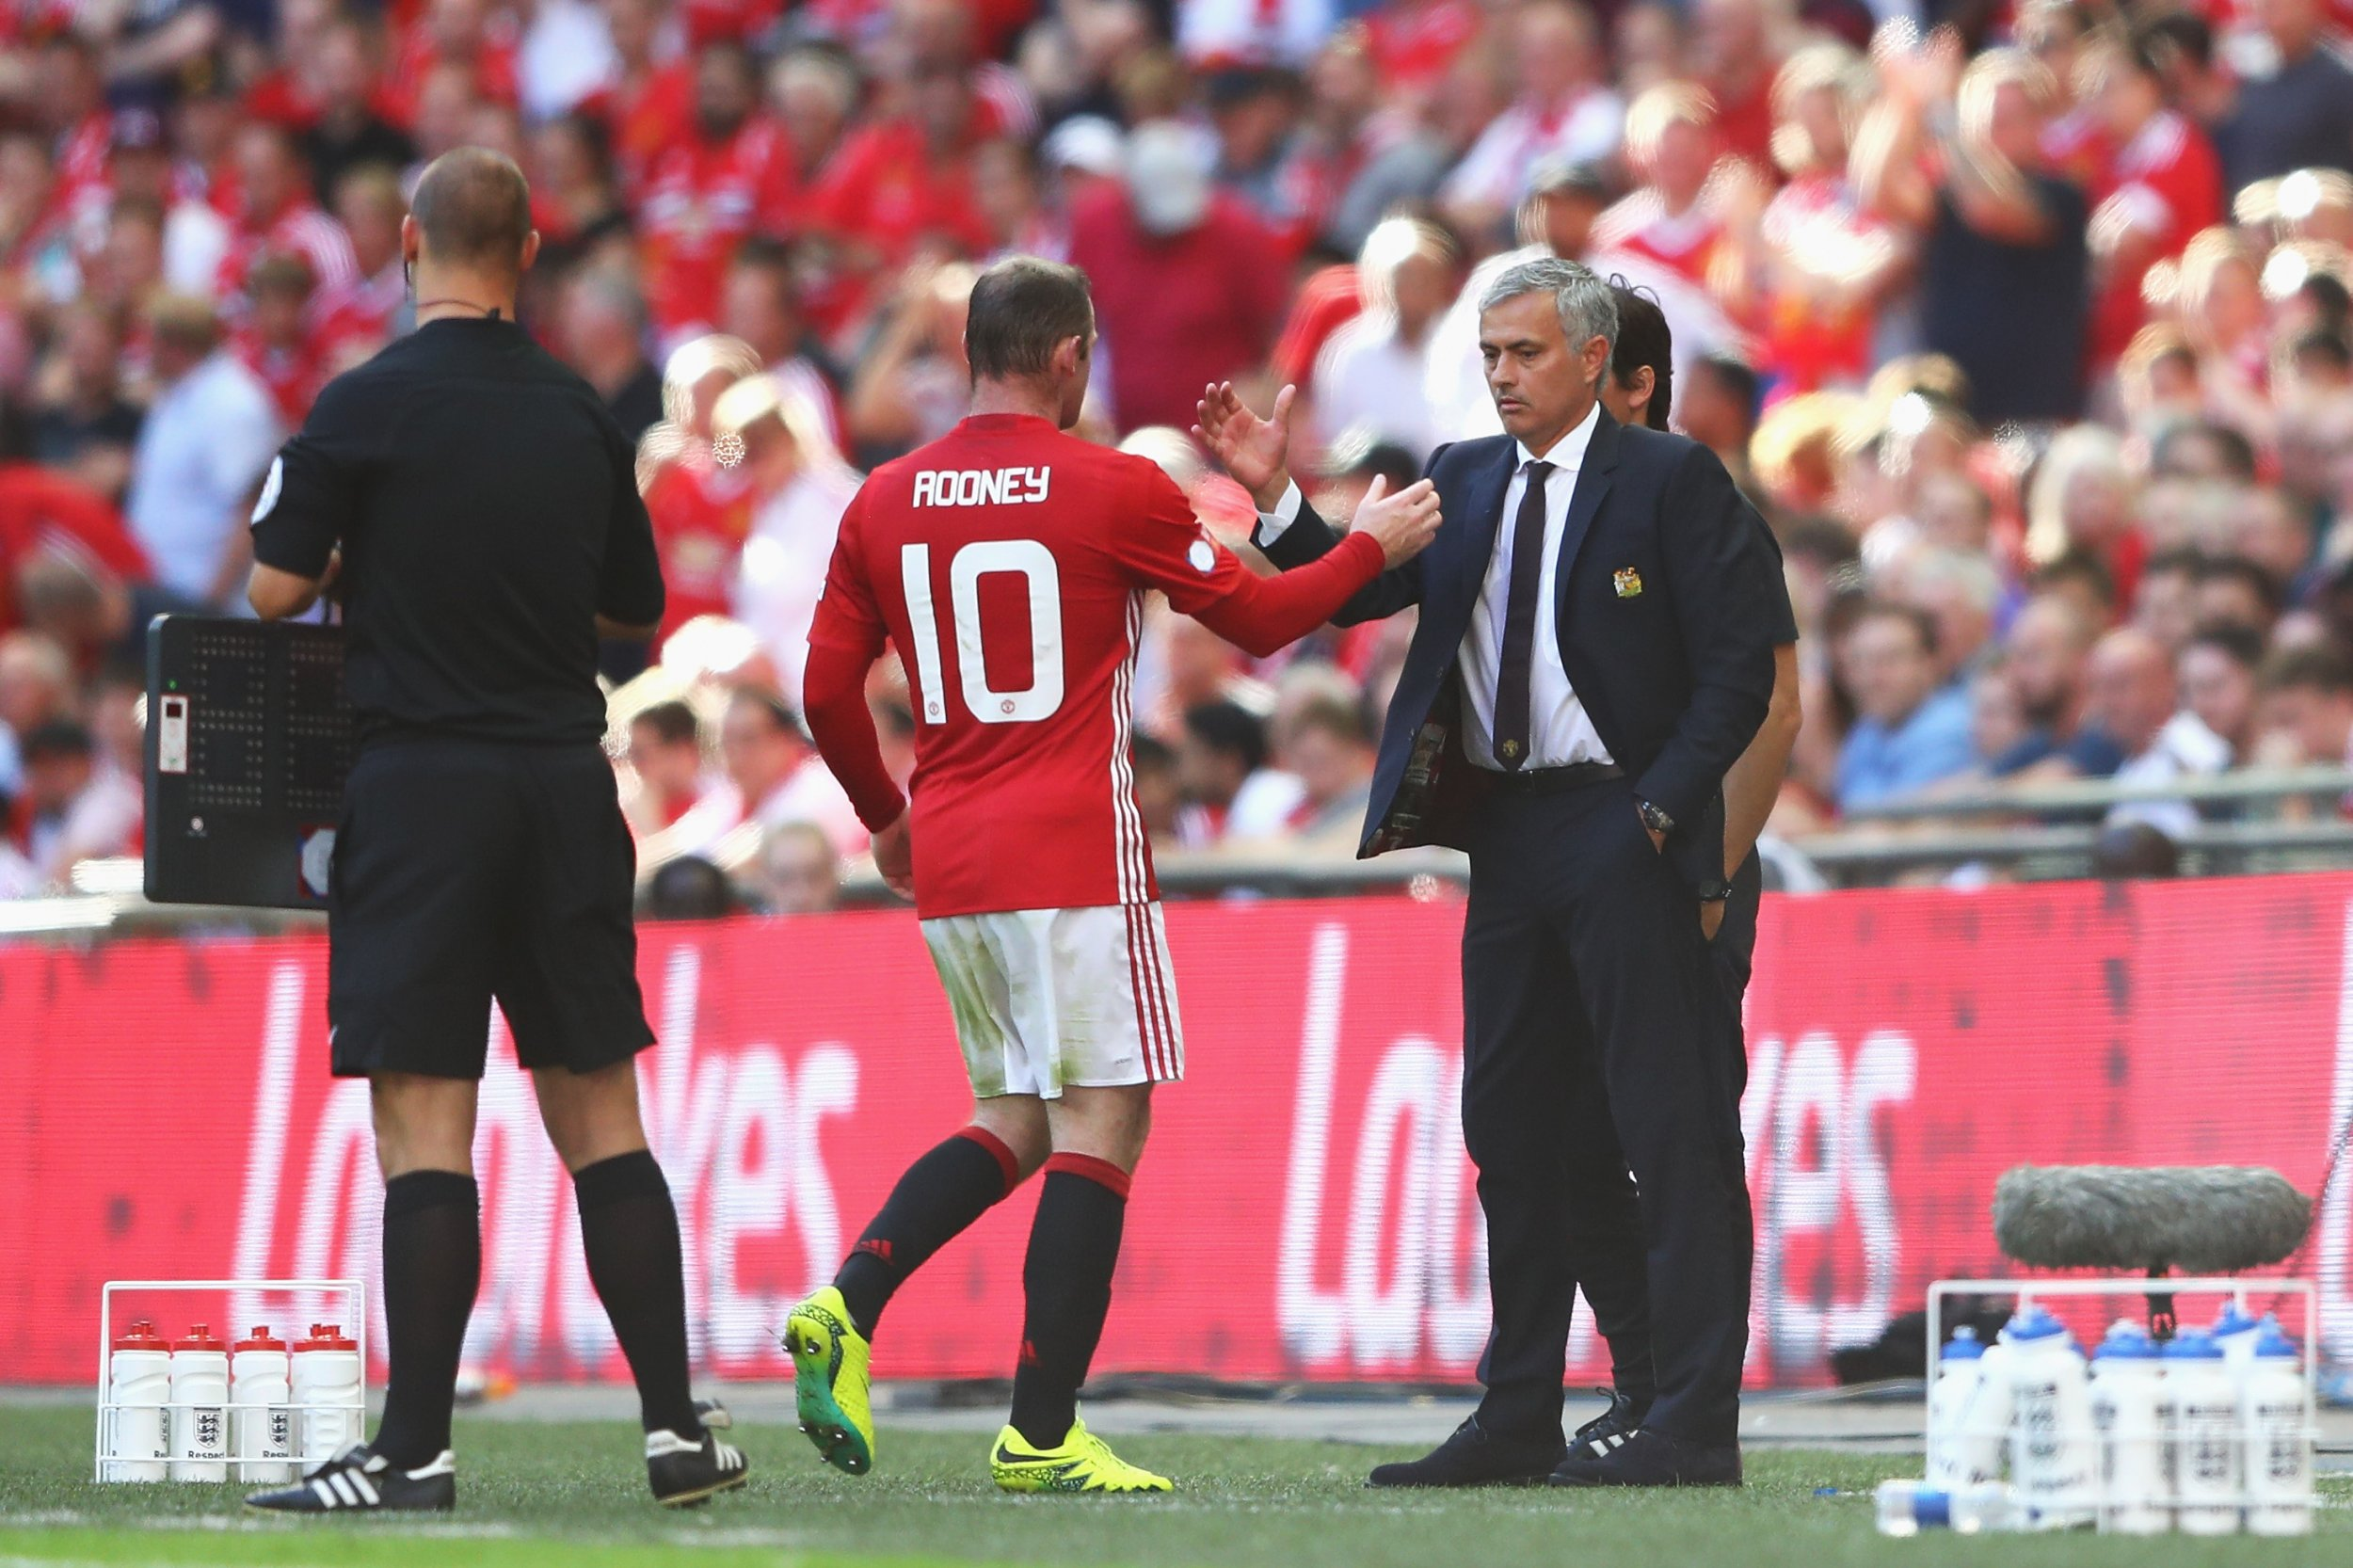 Jose Mourinho with Manchester United captain Wayne Rooney